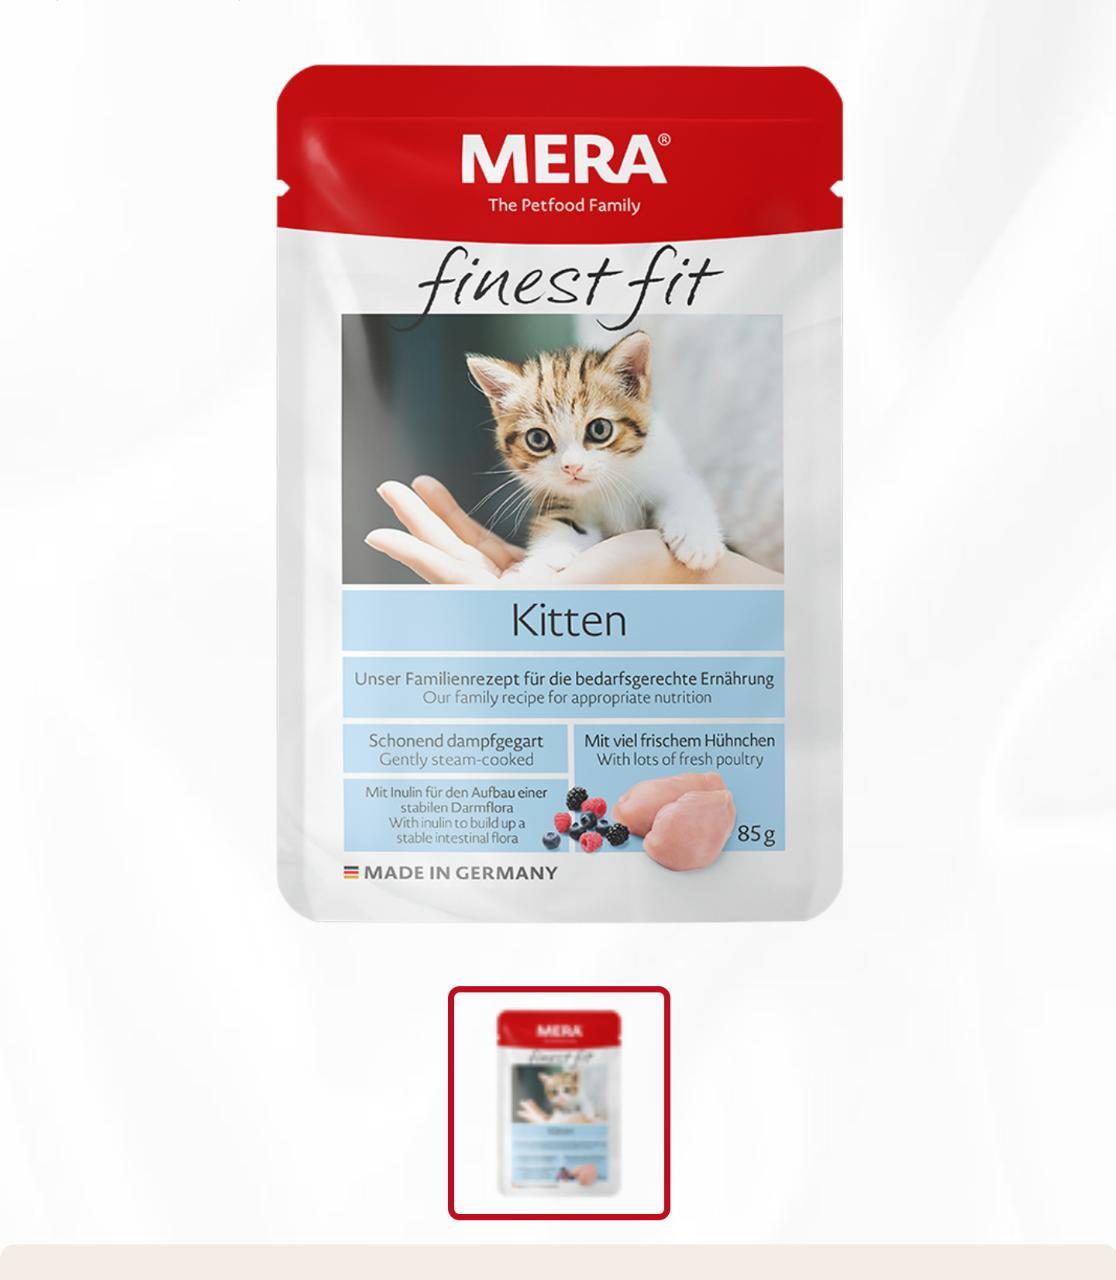 Mera Finest Fit Creamy bite ( Cat Snack ) 80g Kitten - Pet Food - Pet Store - Pet supplies